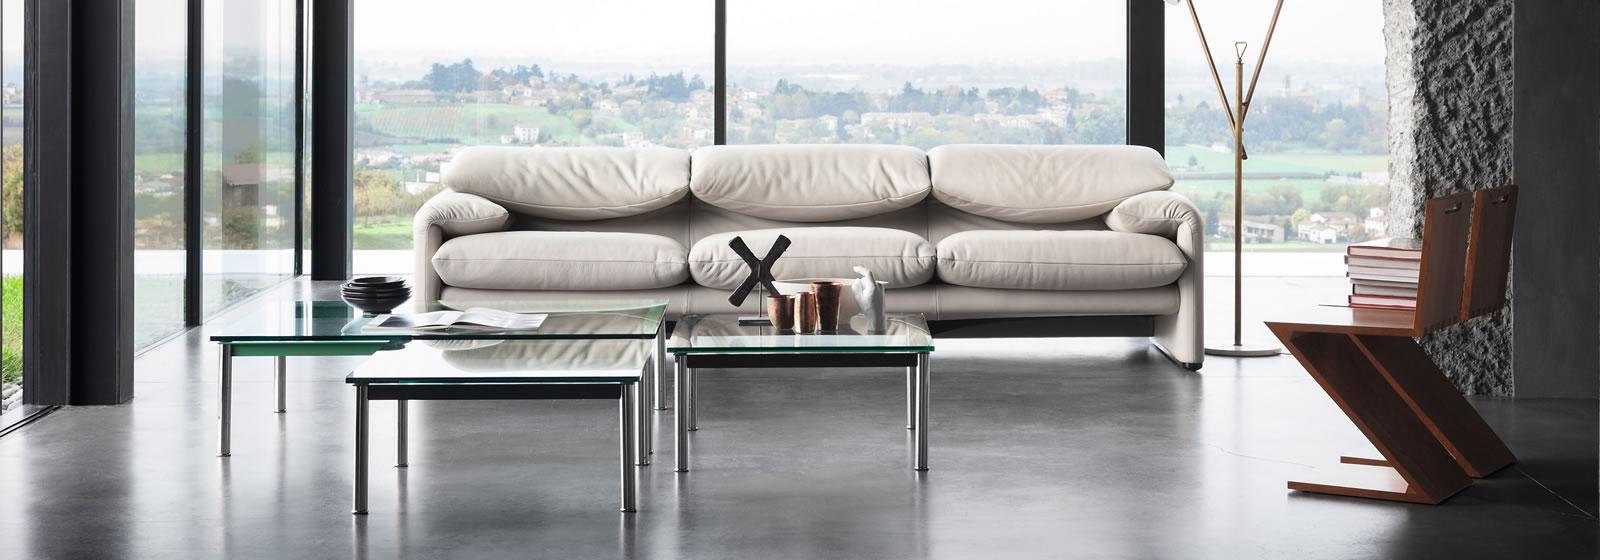 maralunga cassina. Black Bedroom Furniture Sets. Home Design Ideas